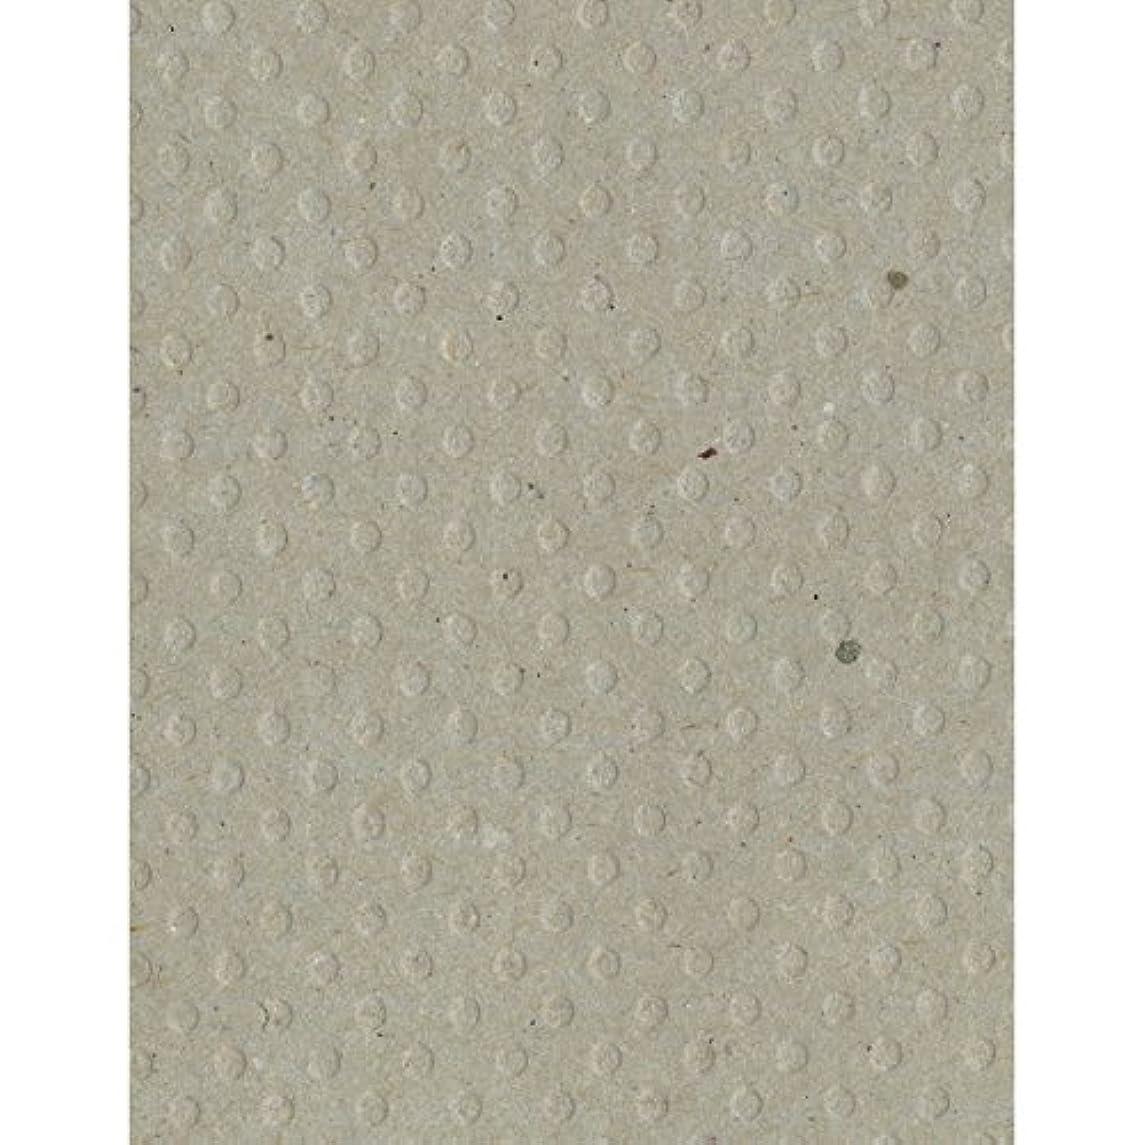 Bazzill 25 Sheets Dotted Swiss Kraft, 8.5 x 11